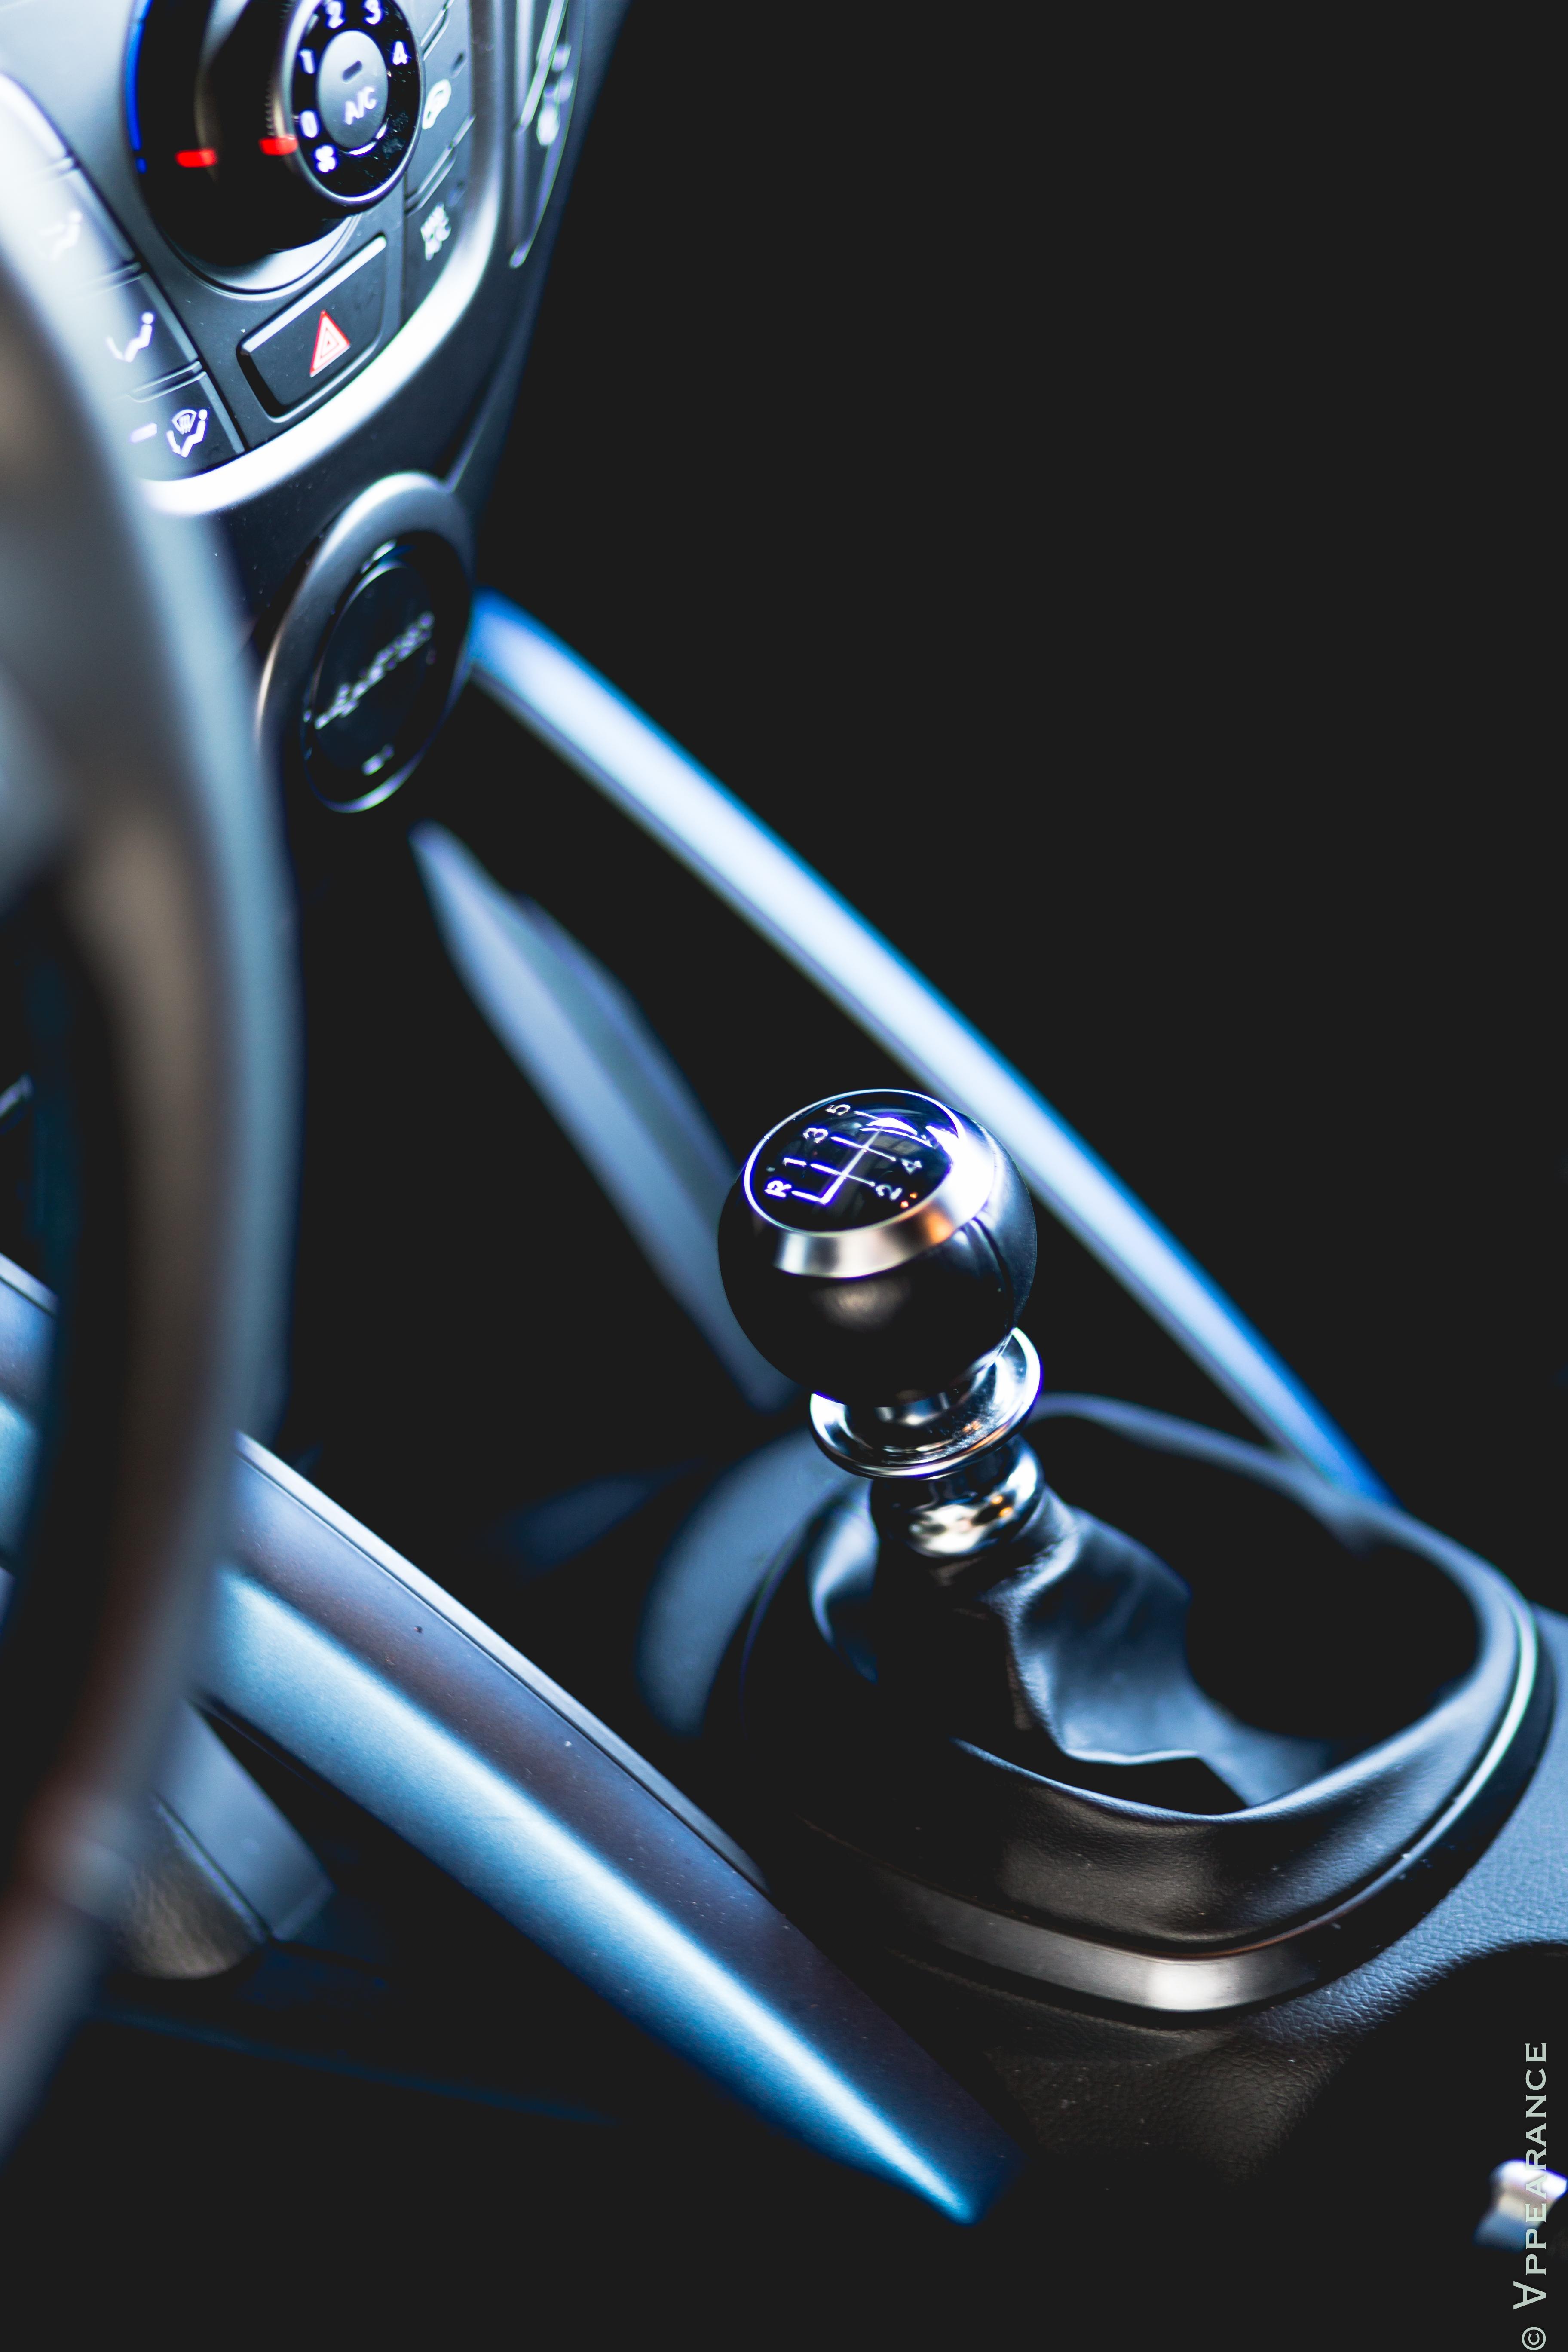 2016 Hyundai Veloster Rally Edition Transmission